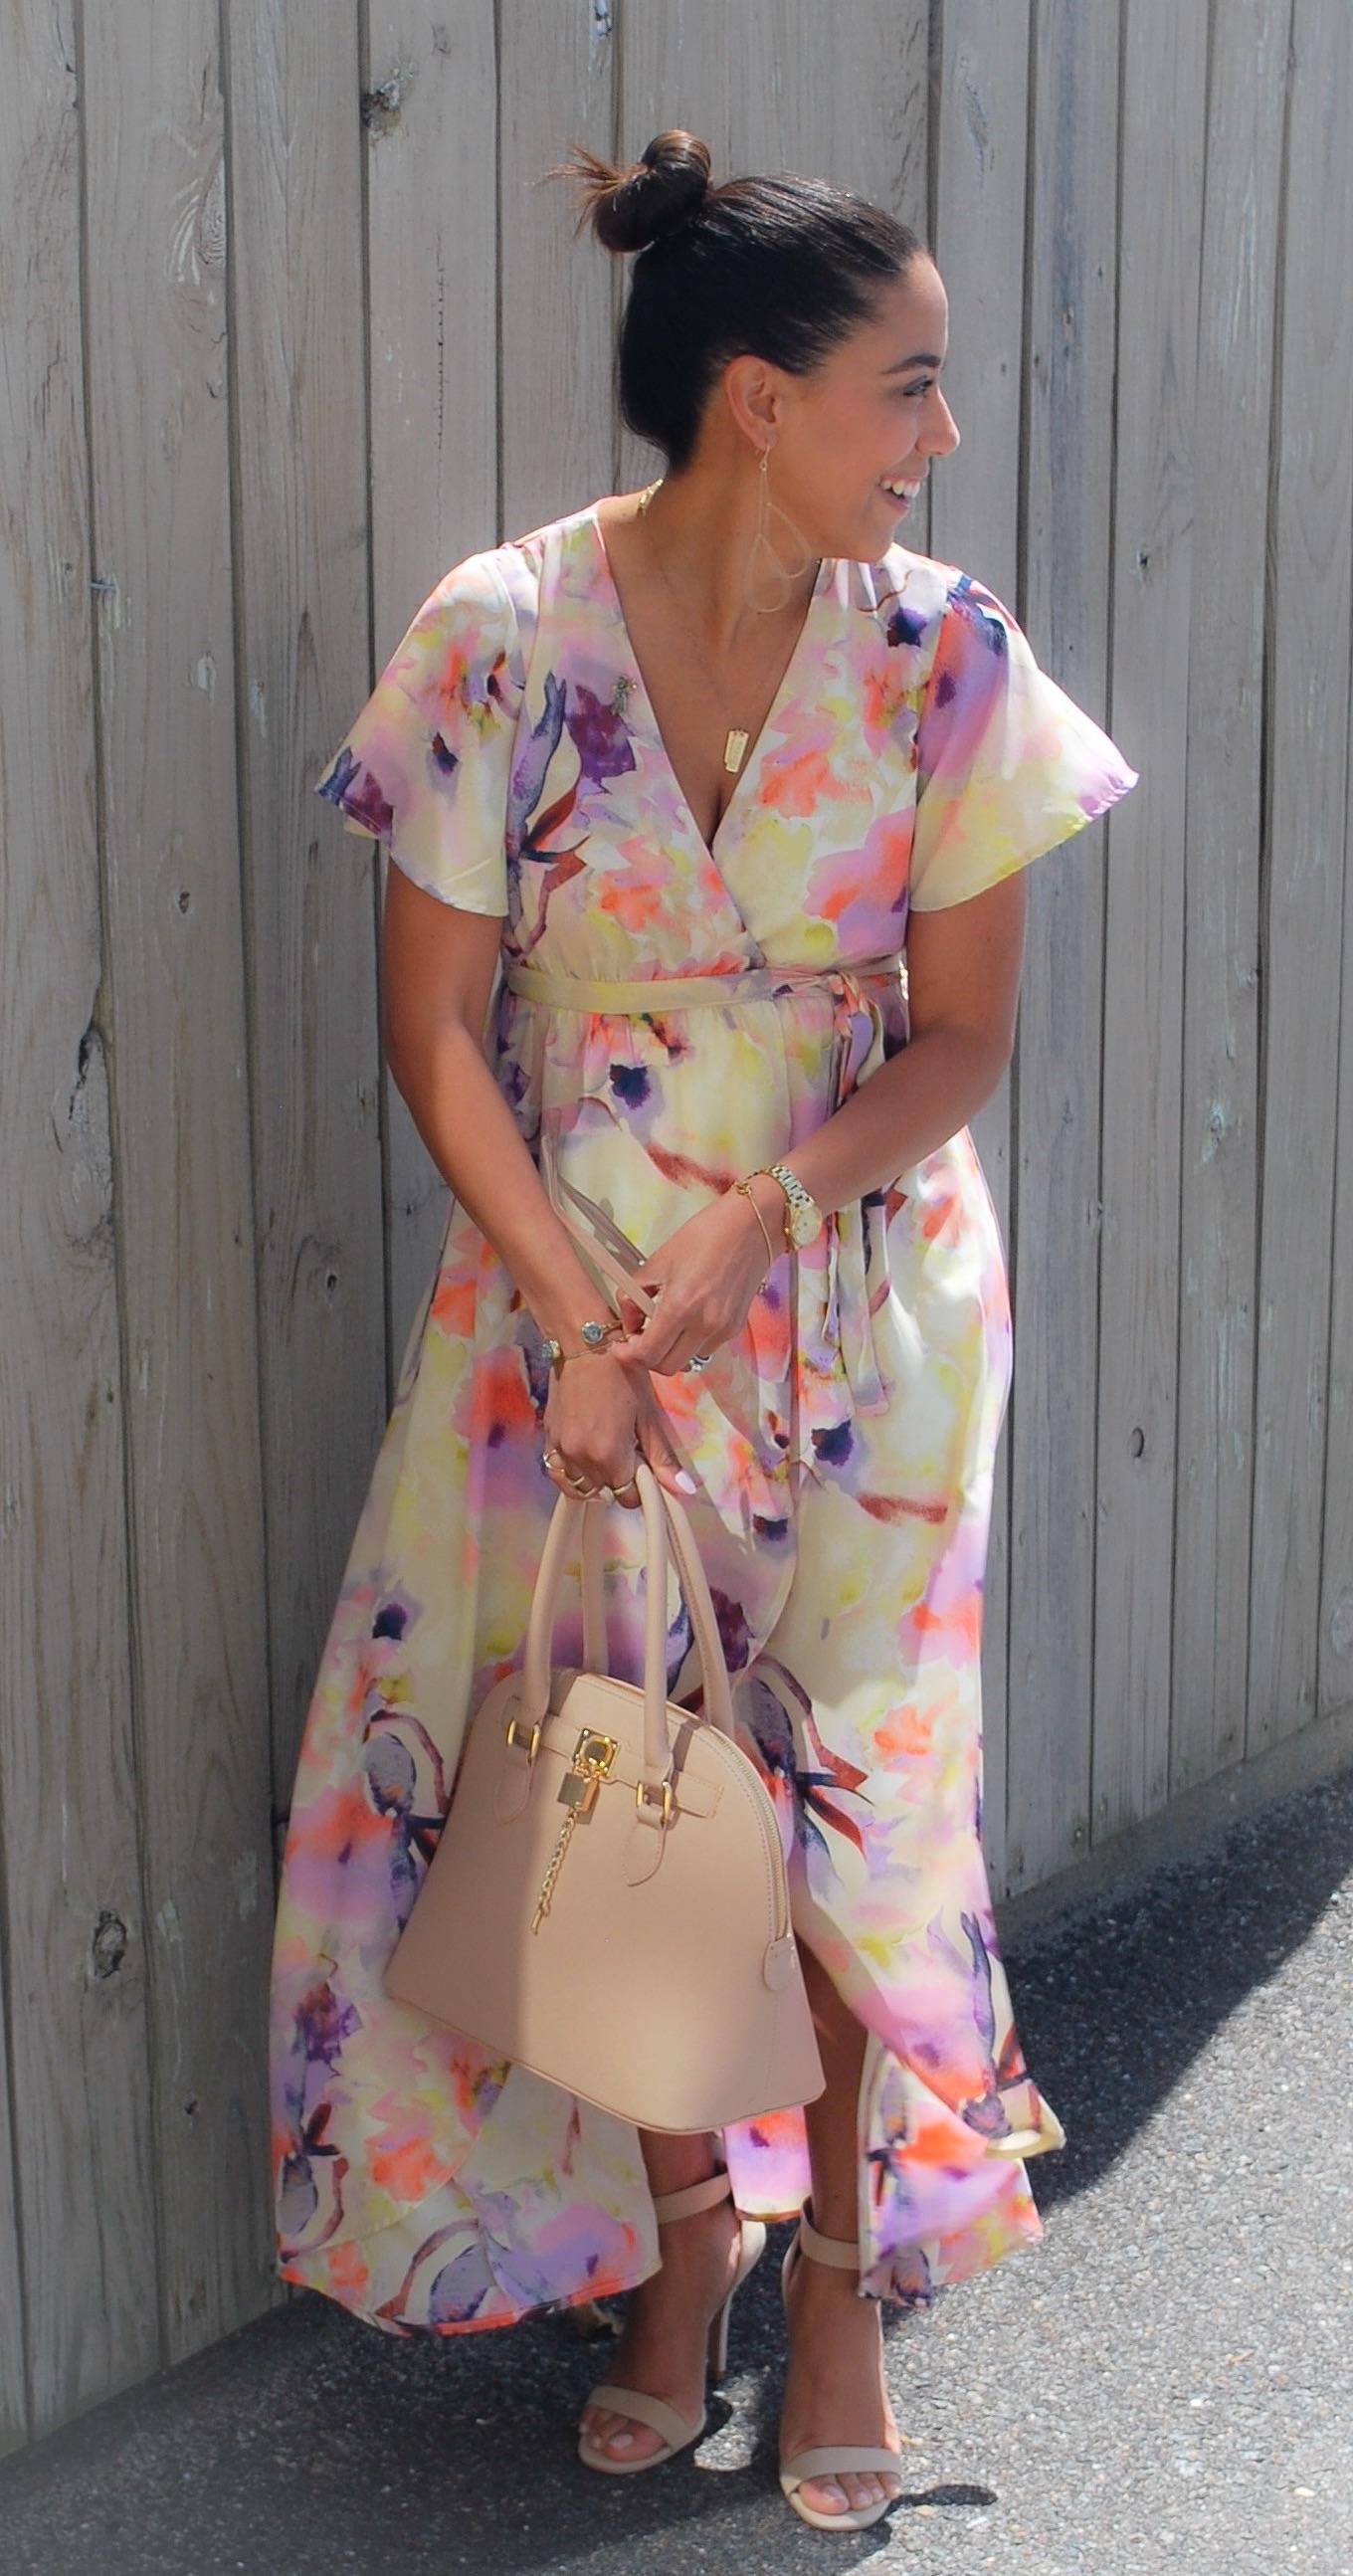 This Season's Gold // Long Floral Print Dress